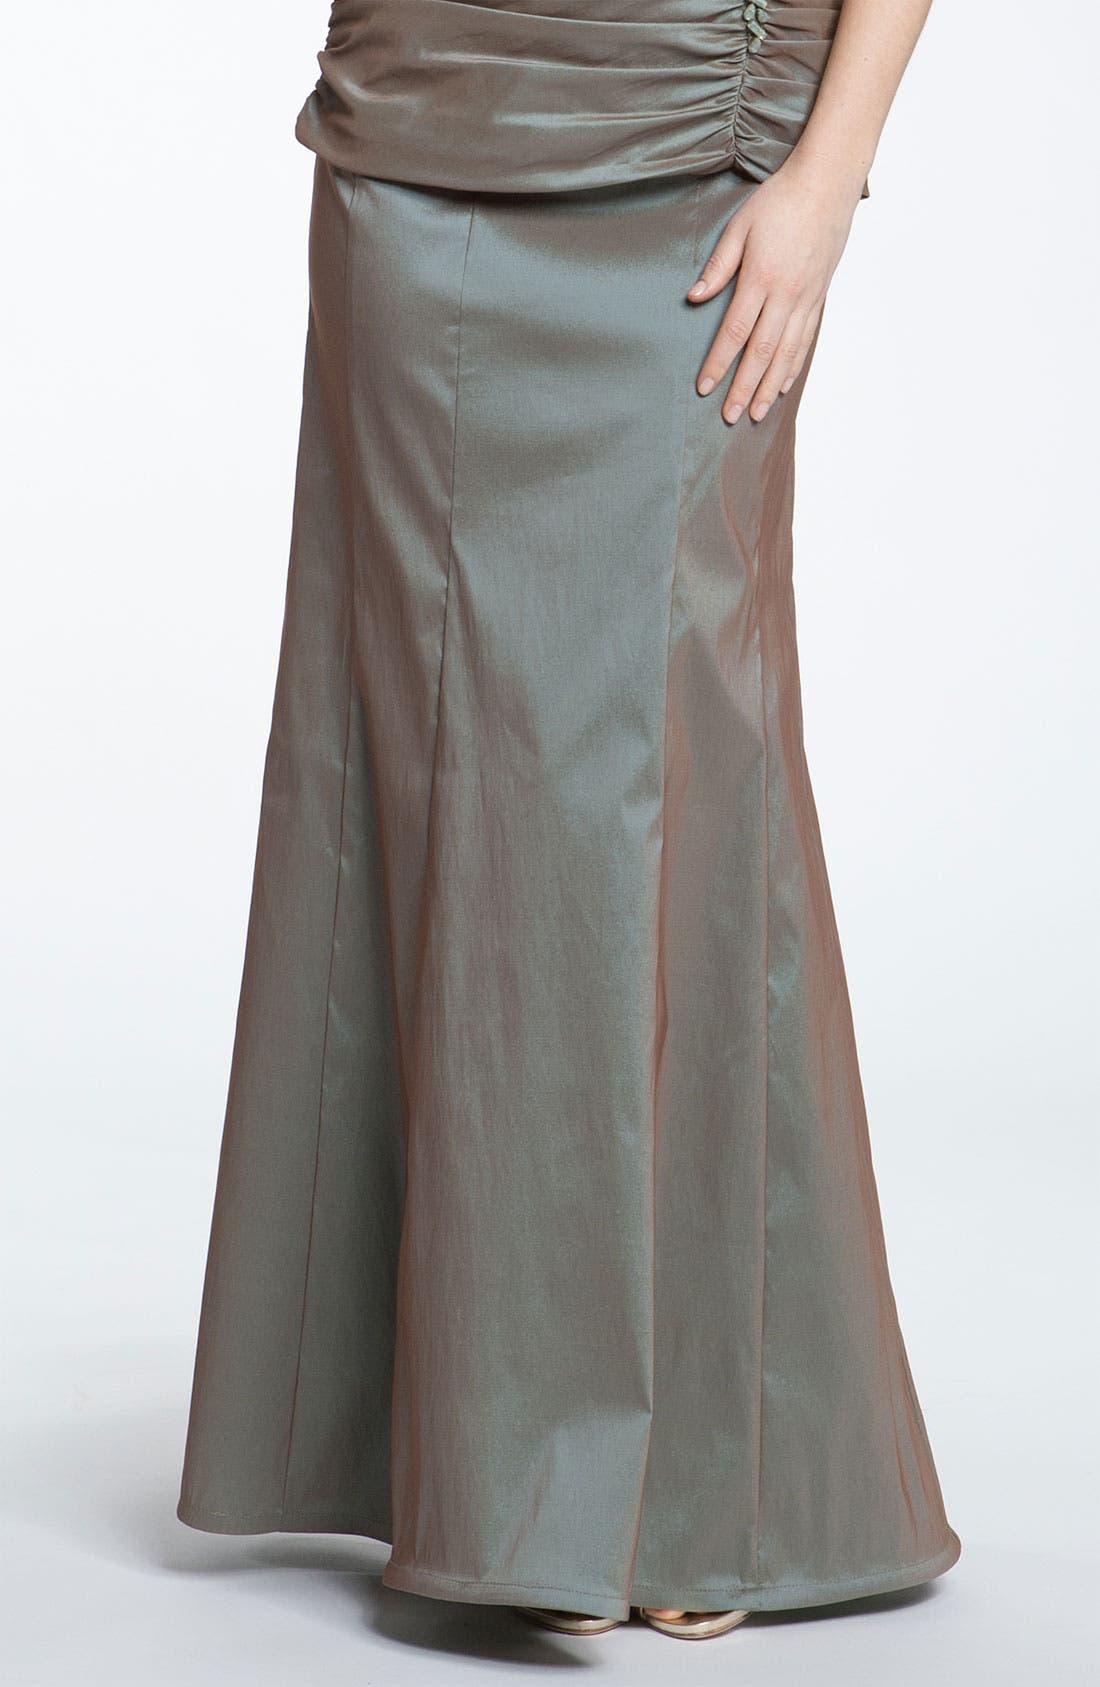 Alternate Image 1 Selected - Tadashi Shoji Taffeta Mermaid Skirt